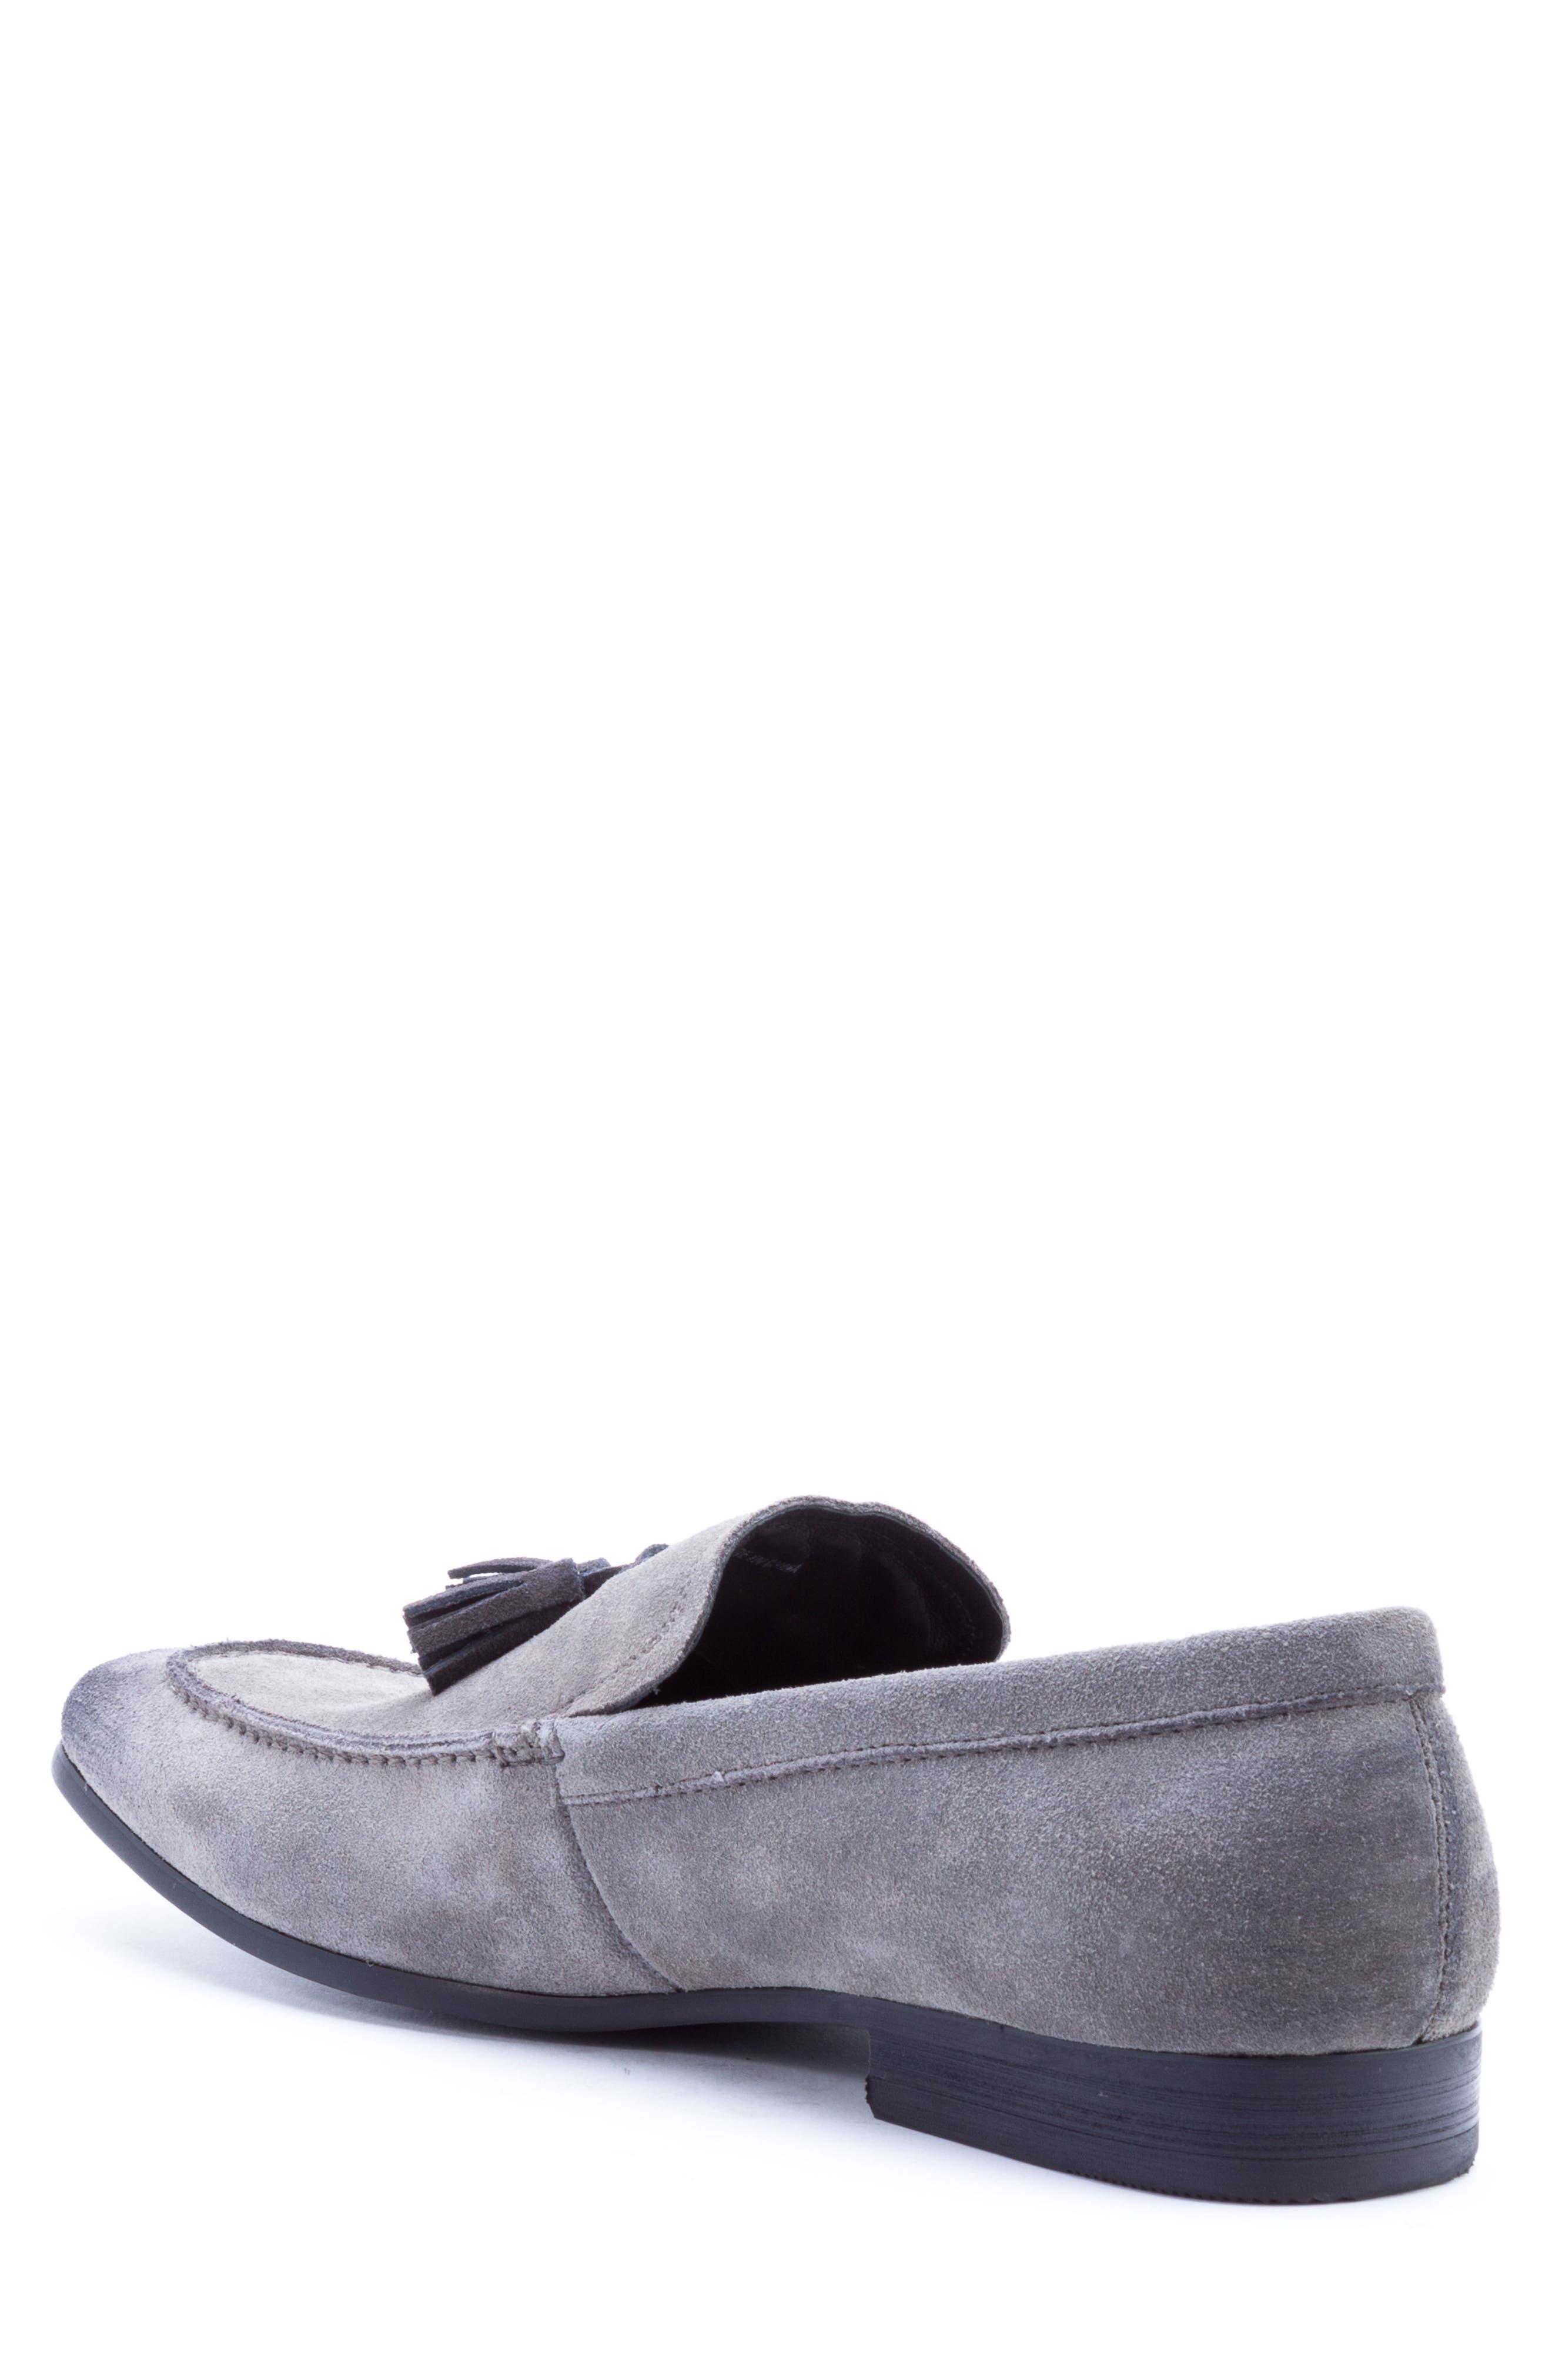 ZANZARA,                             Severn Tassel Venetian Loafer,                             Alternate thumbnail 2, color,                             021